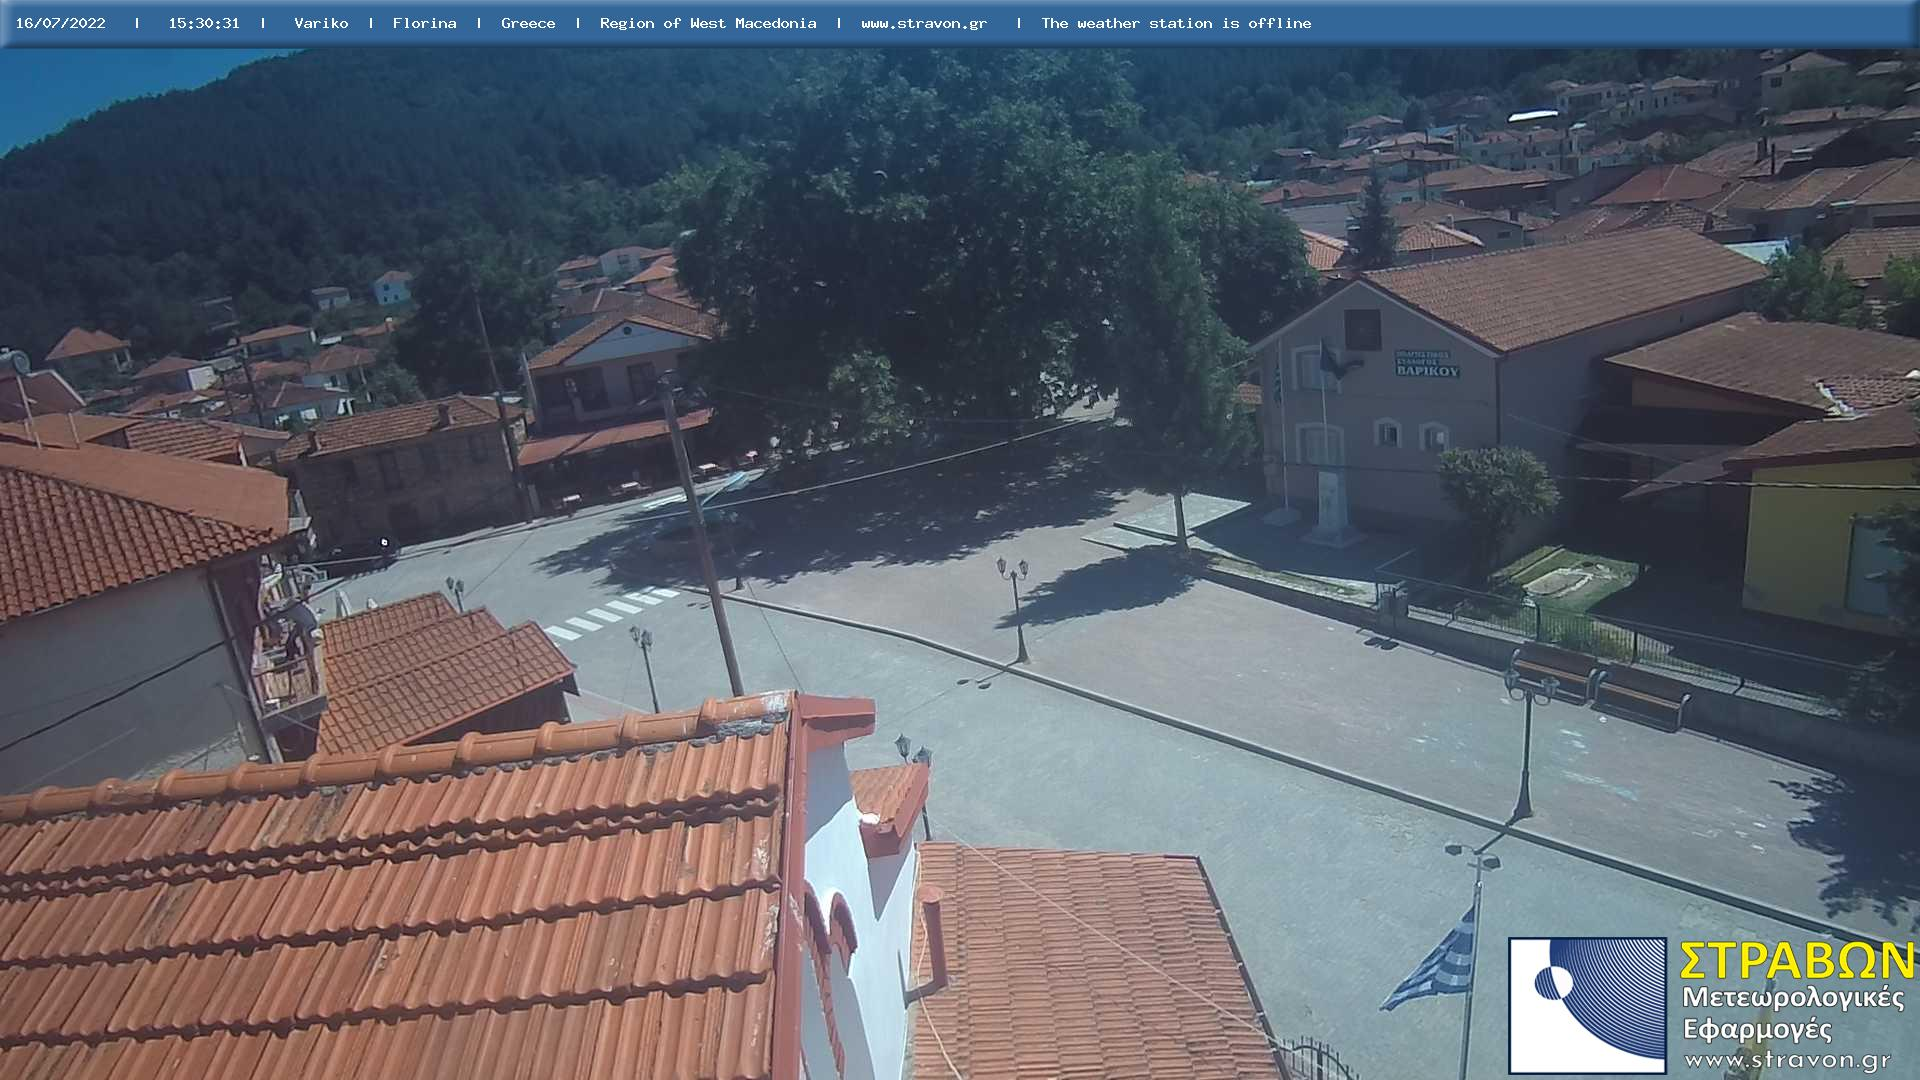 Webcam Πτολεμαΐδα (Βαρικό)